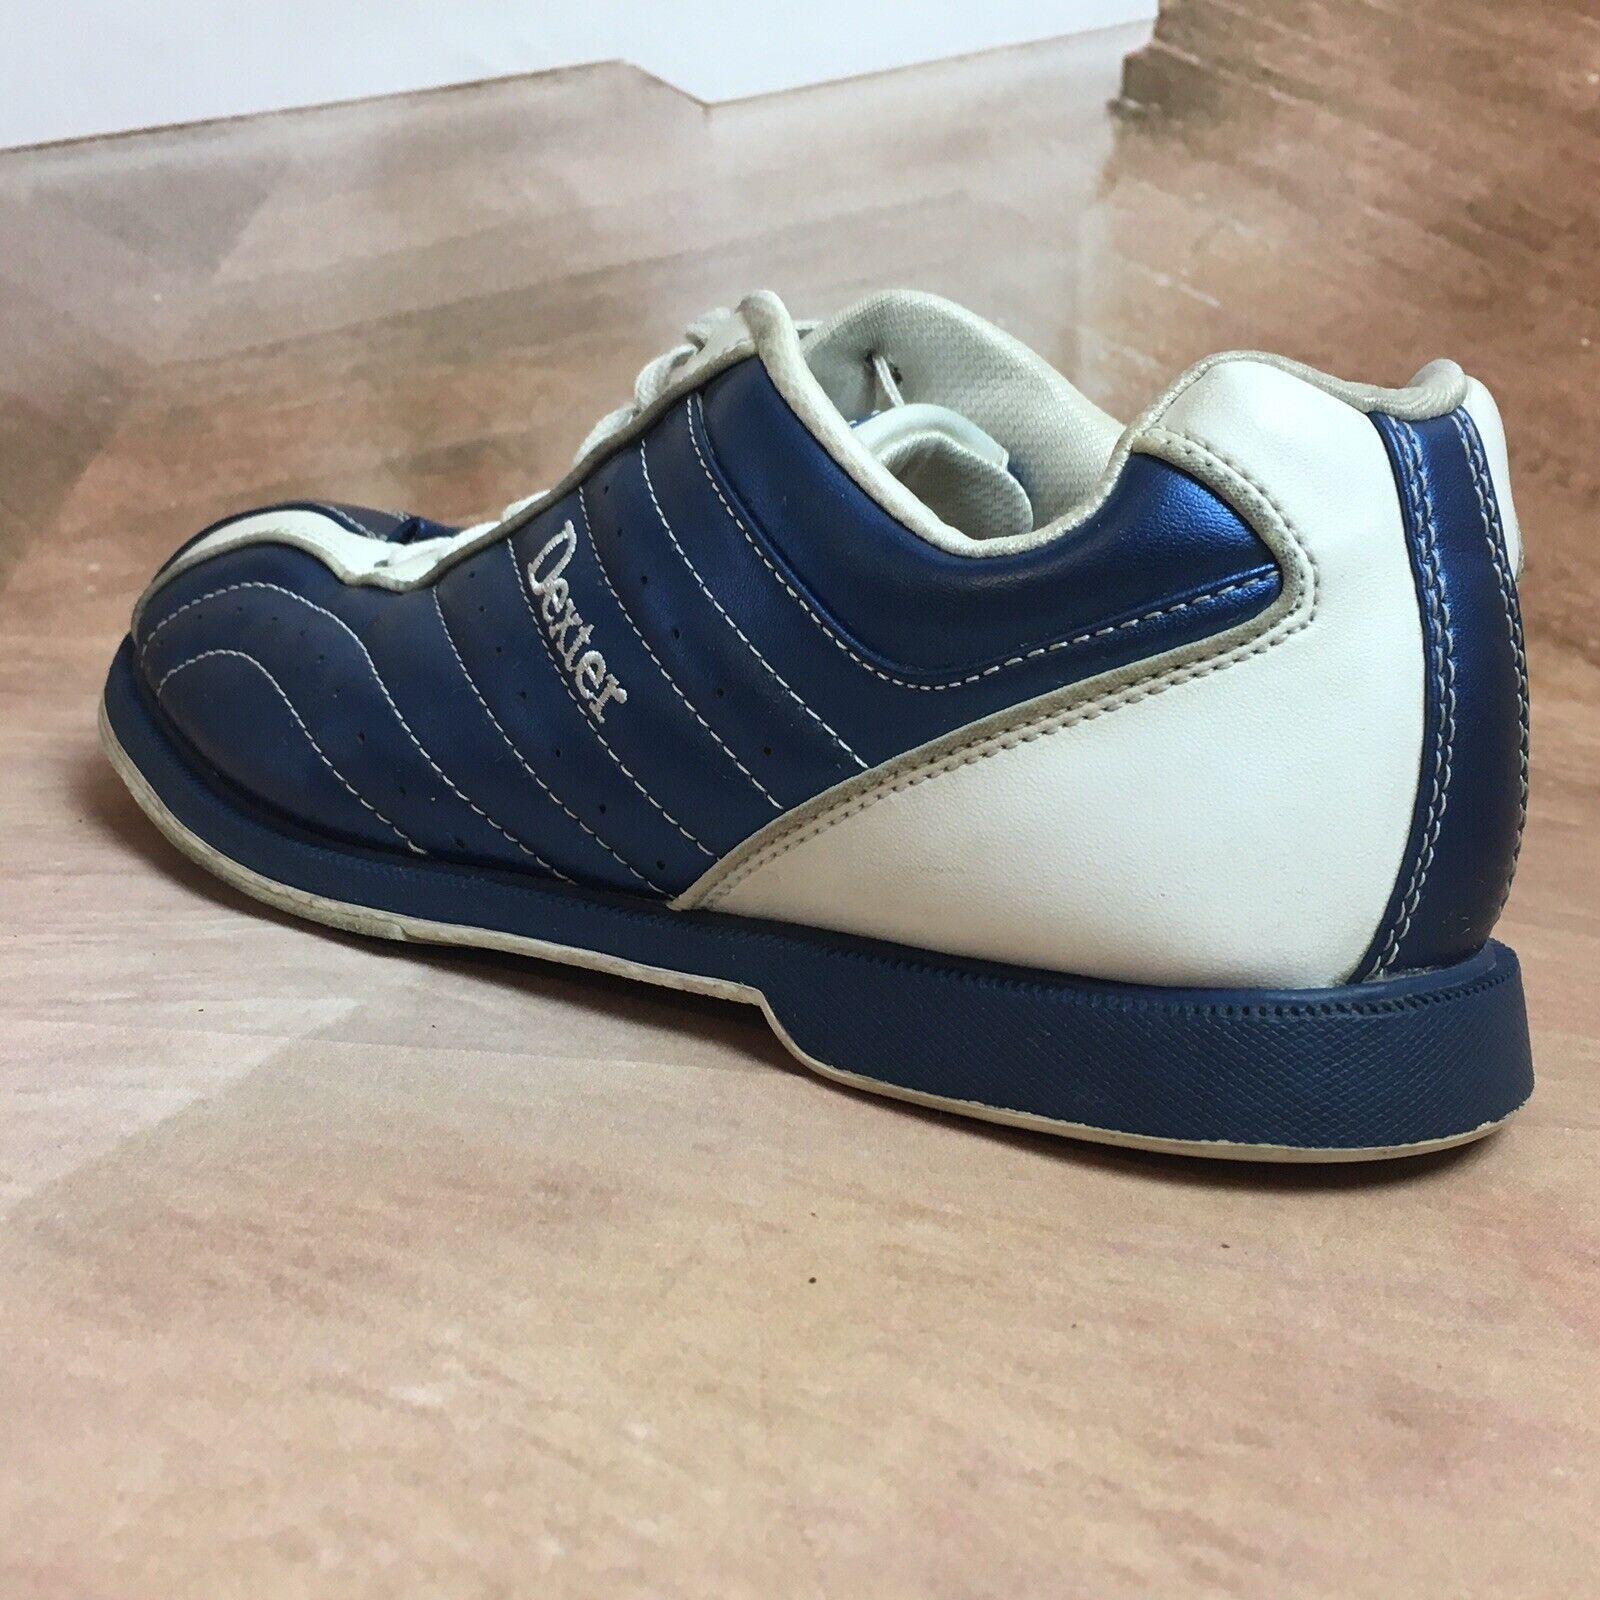 "45839d1c2 Dexter Women s Bowling shoes ""Groove"" Slide Neon blueee Sz 10M Team Sports"